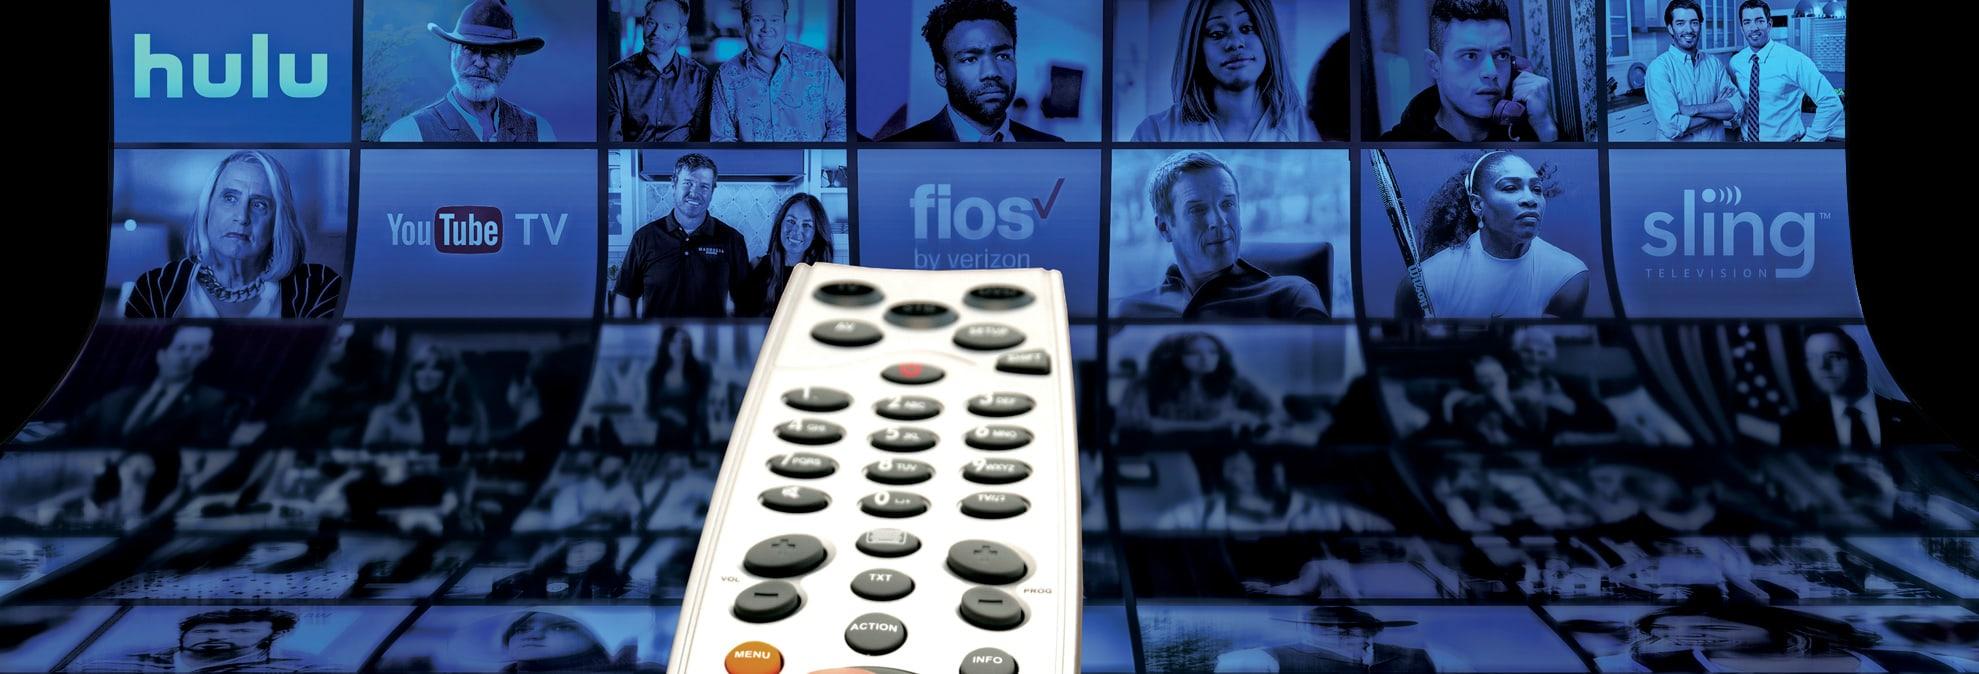 New Cheaper Ways To Watch Tv Consumer Reports Magic Jack Internet Phone